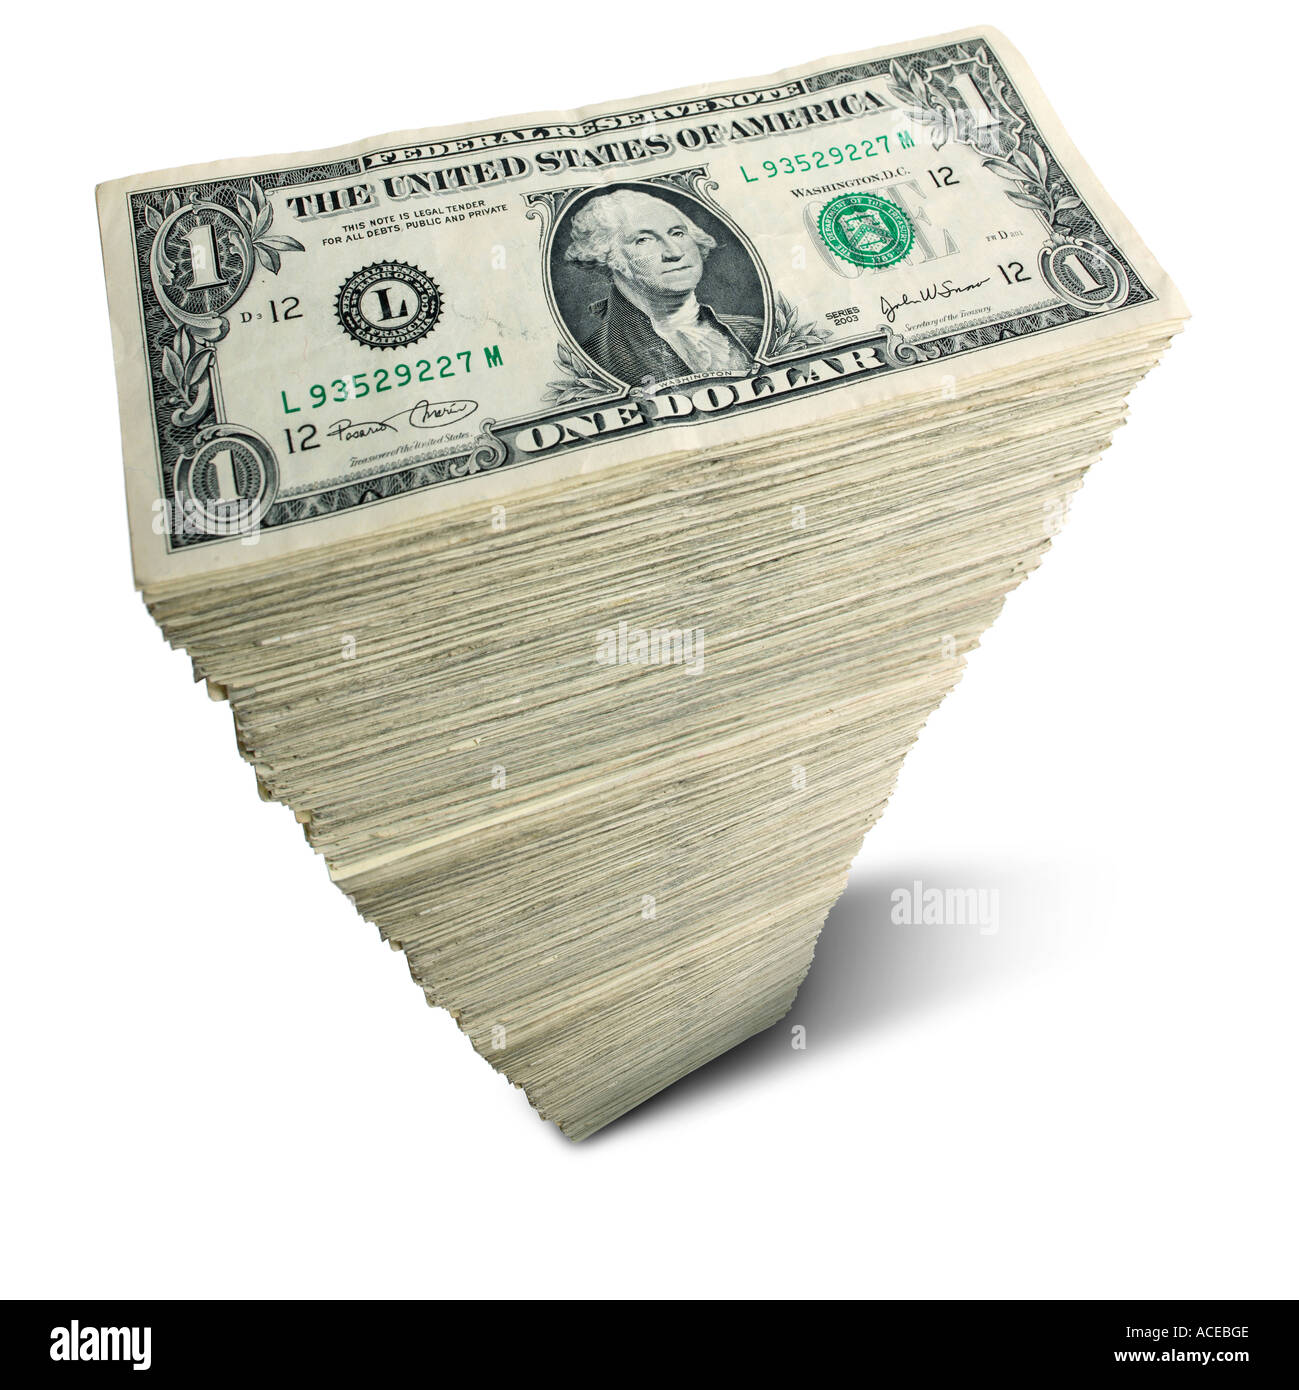 Stack of US 1 dollar bills - Stock Image